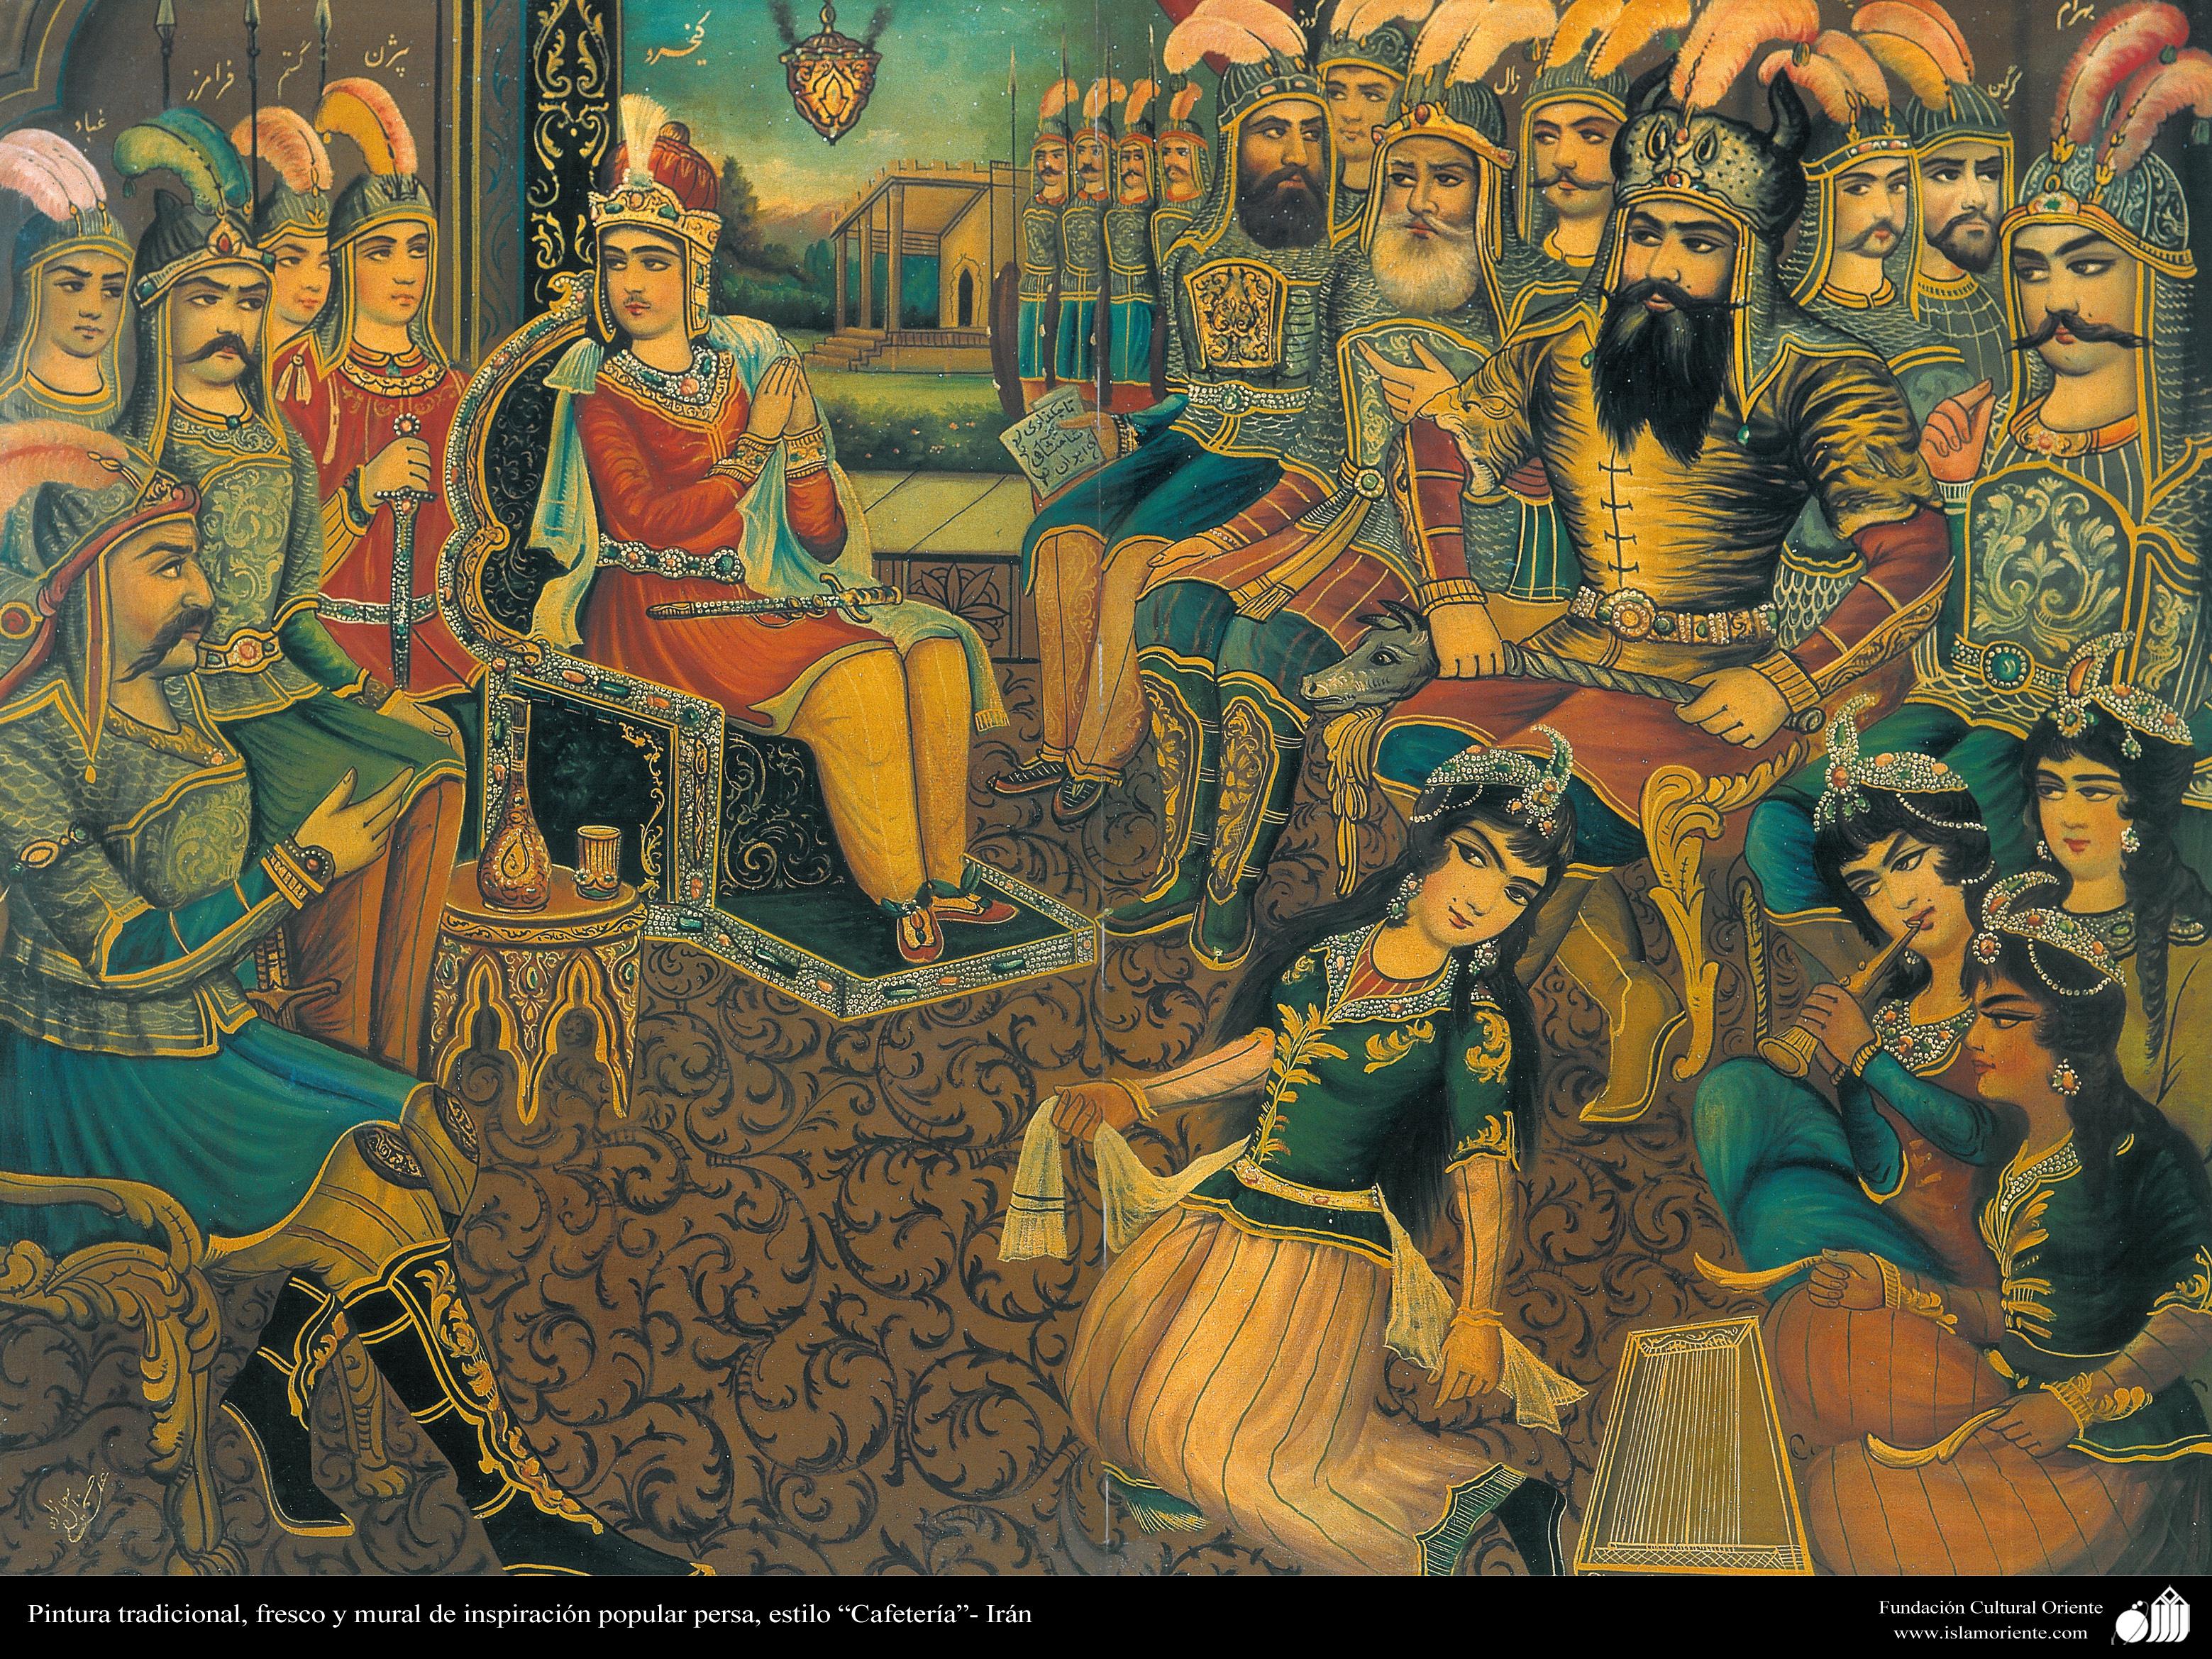 Pintura Tradicional Fresco Y Mural De Inspiraci N Popular